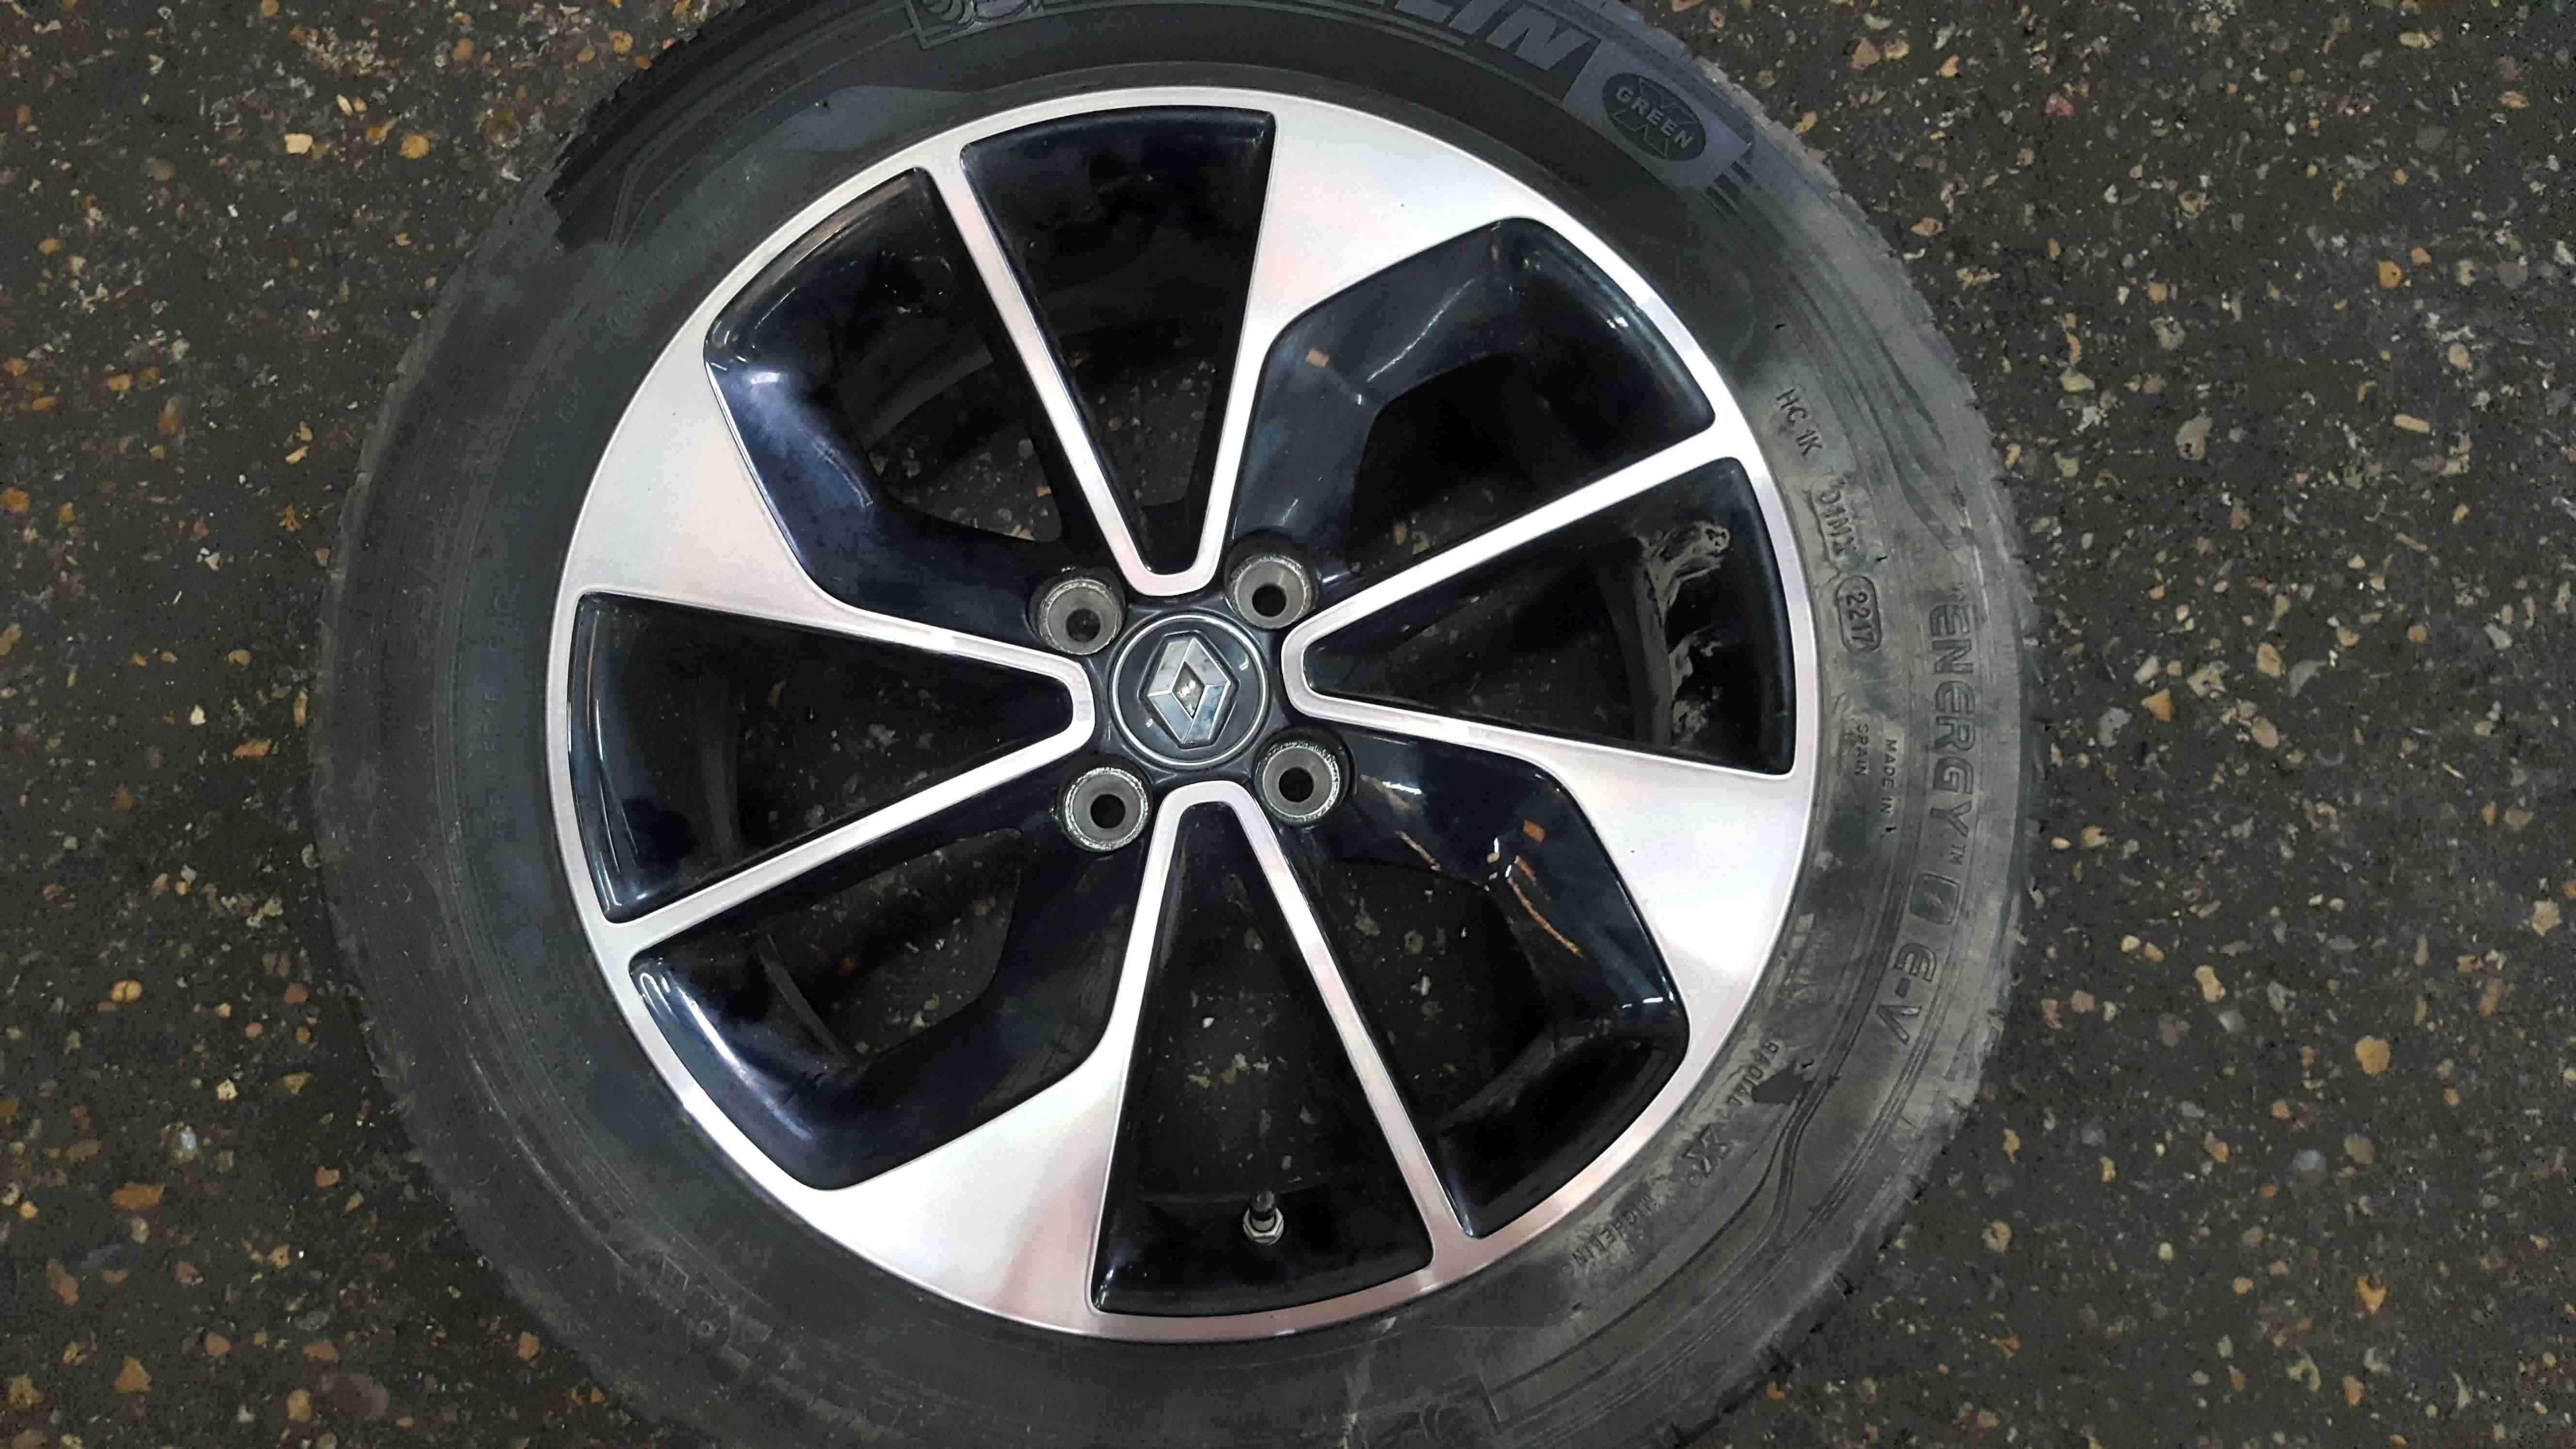 Renault Zoe 2012-2016 Alloy Wheel + Tyre 195 55 16 4mm 403009927R